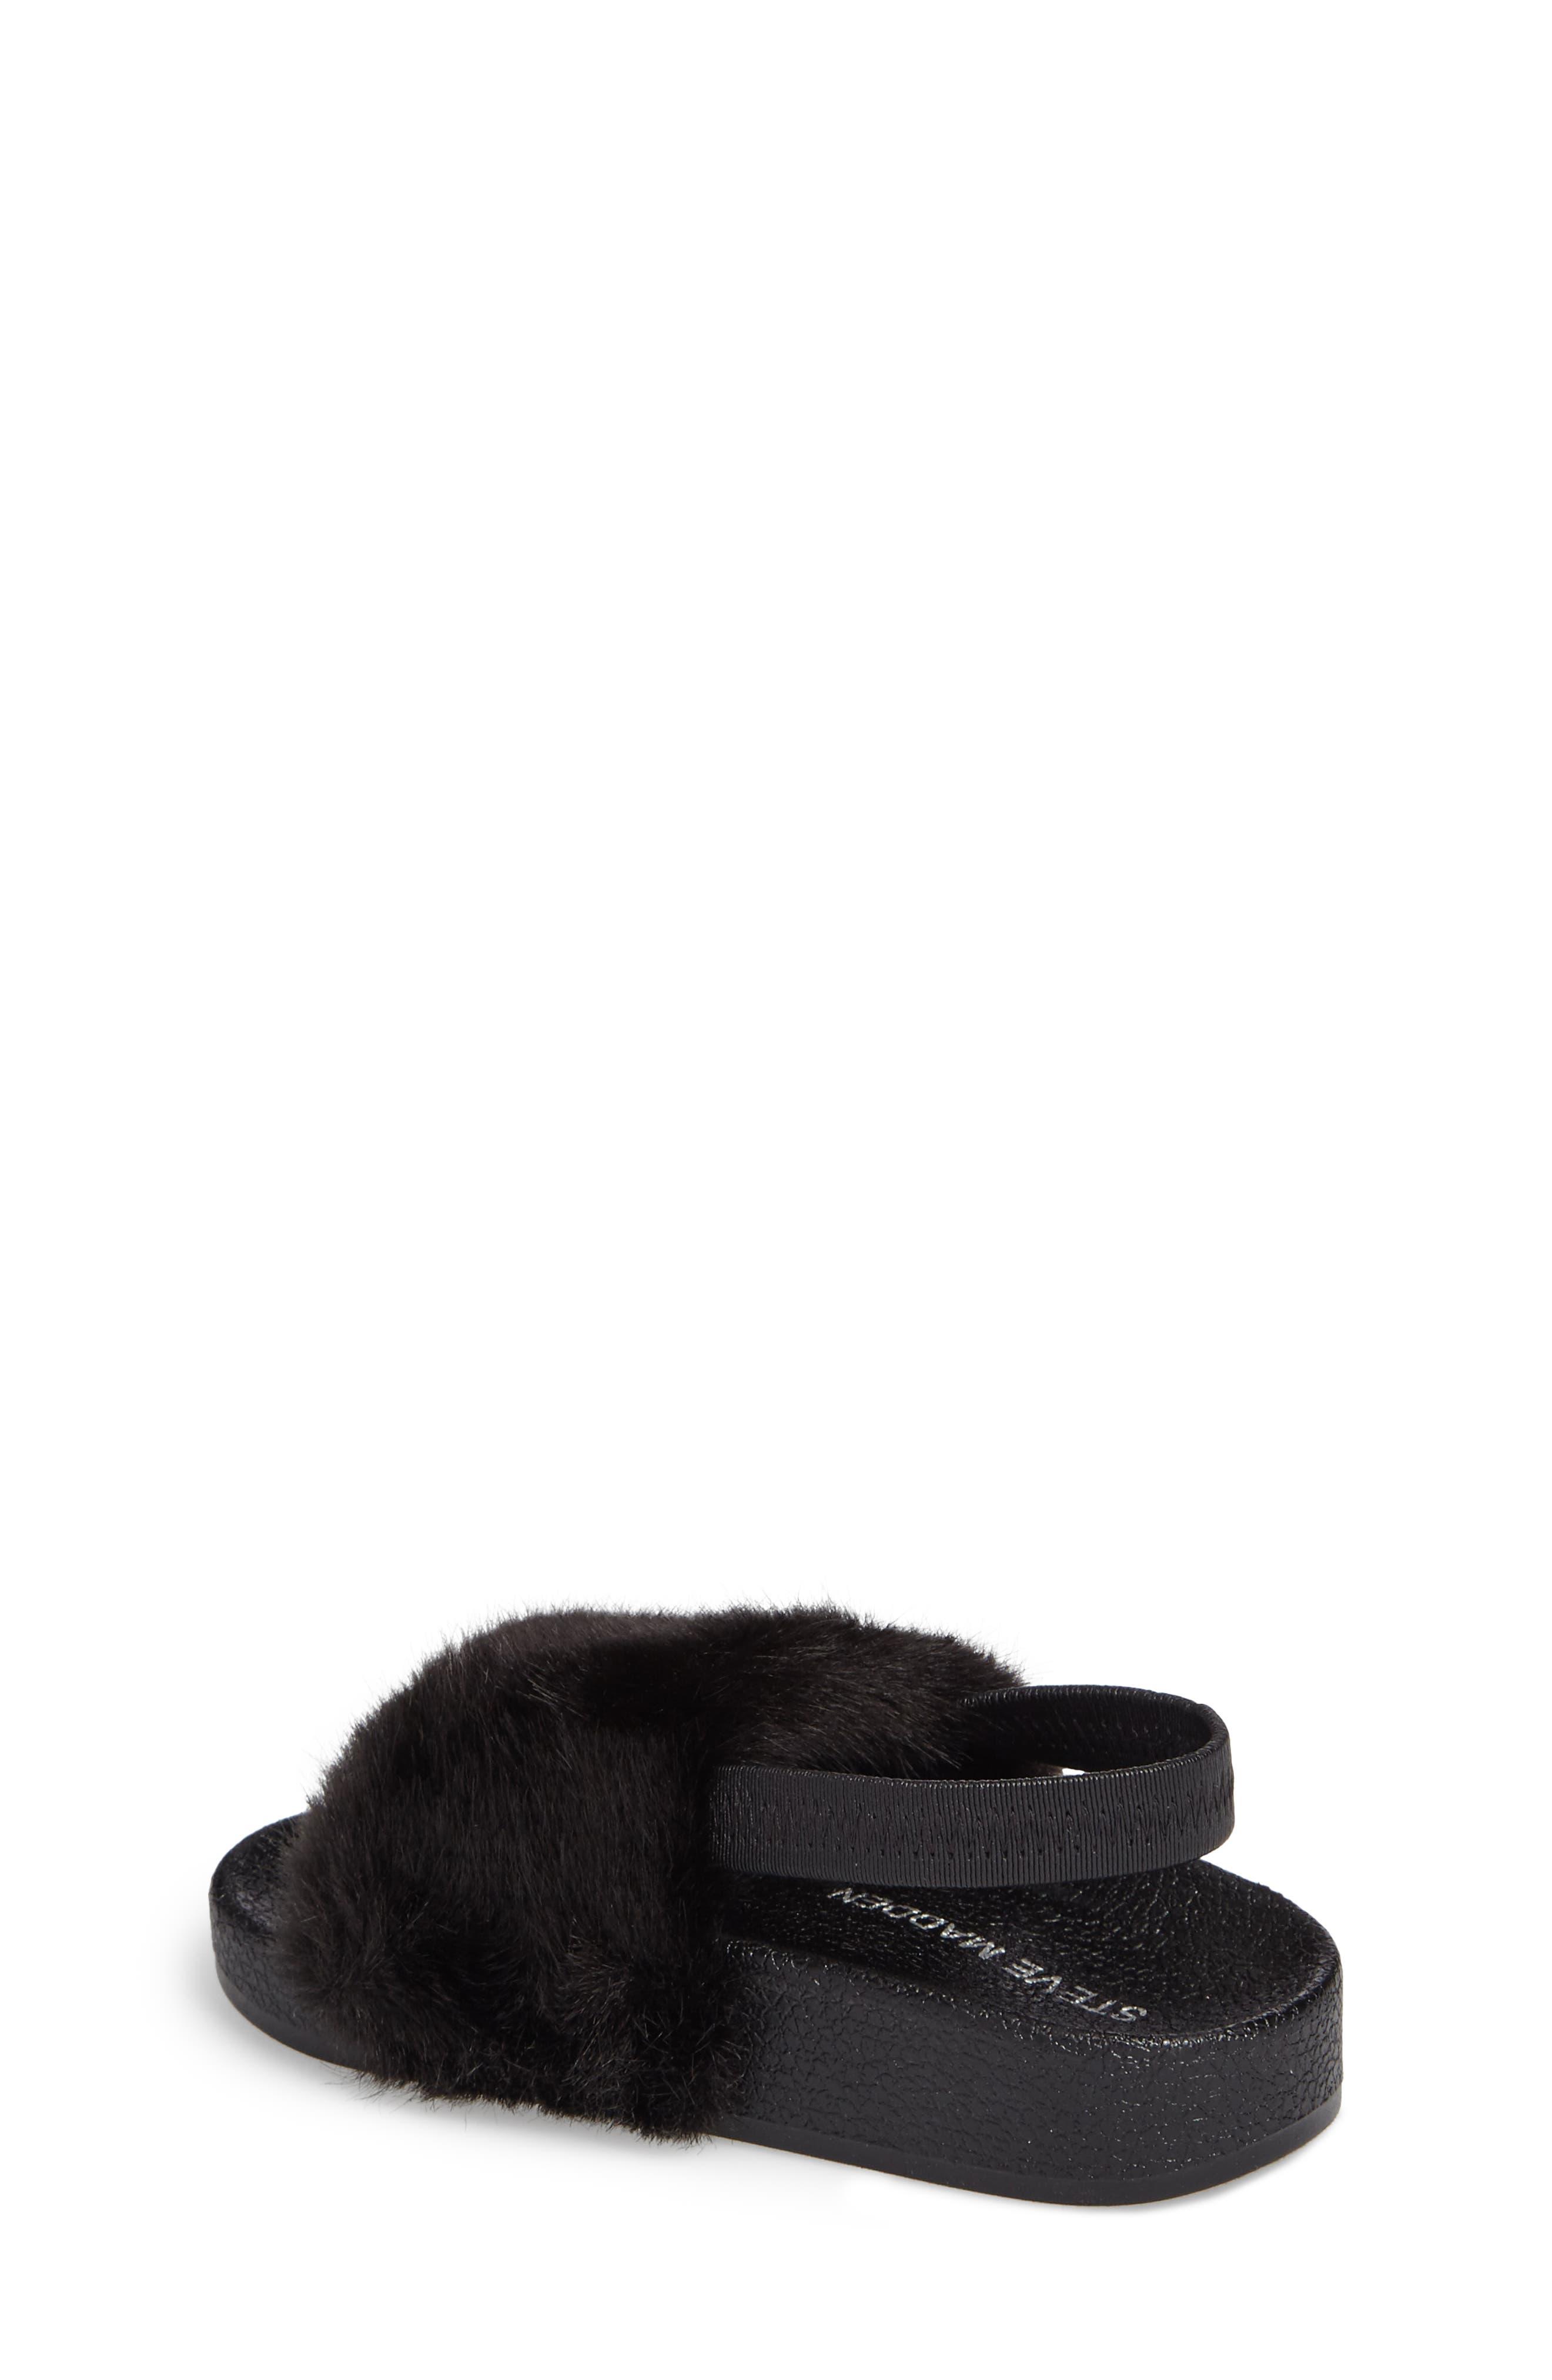 Tsoftey Faux Fur Slide Sandal,                             Alternate thumbnail 2, color,                             006